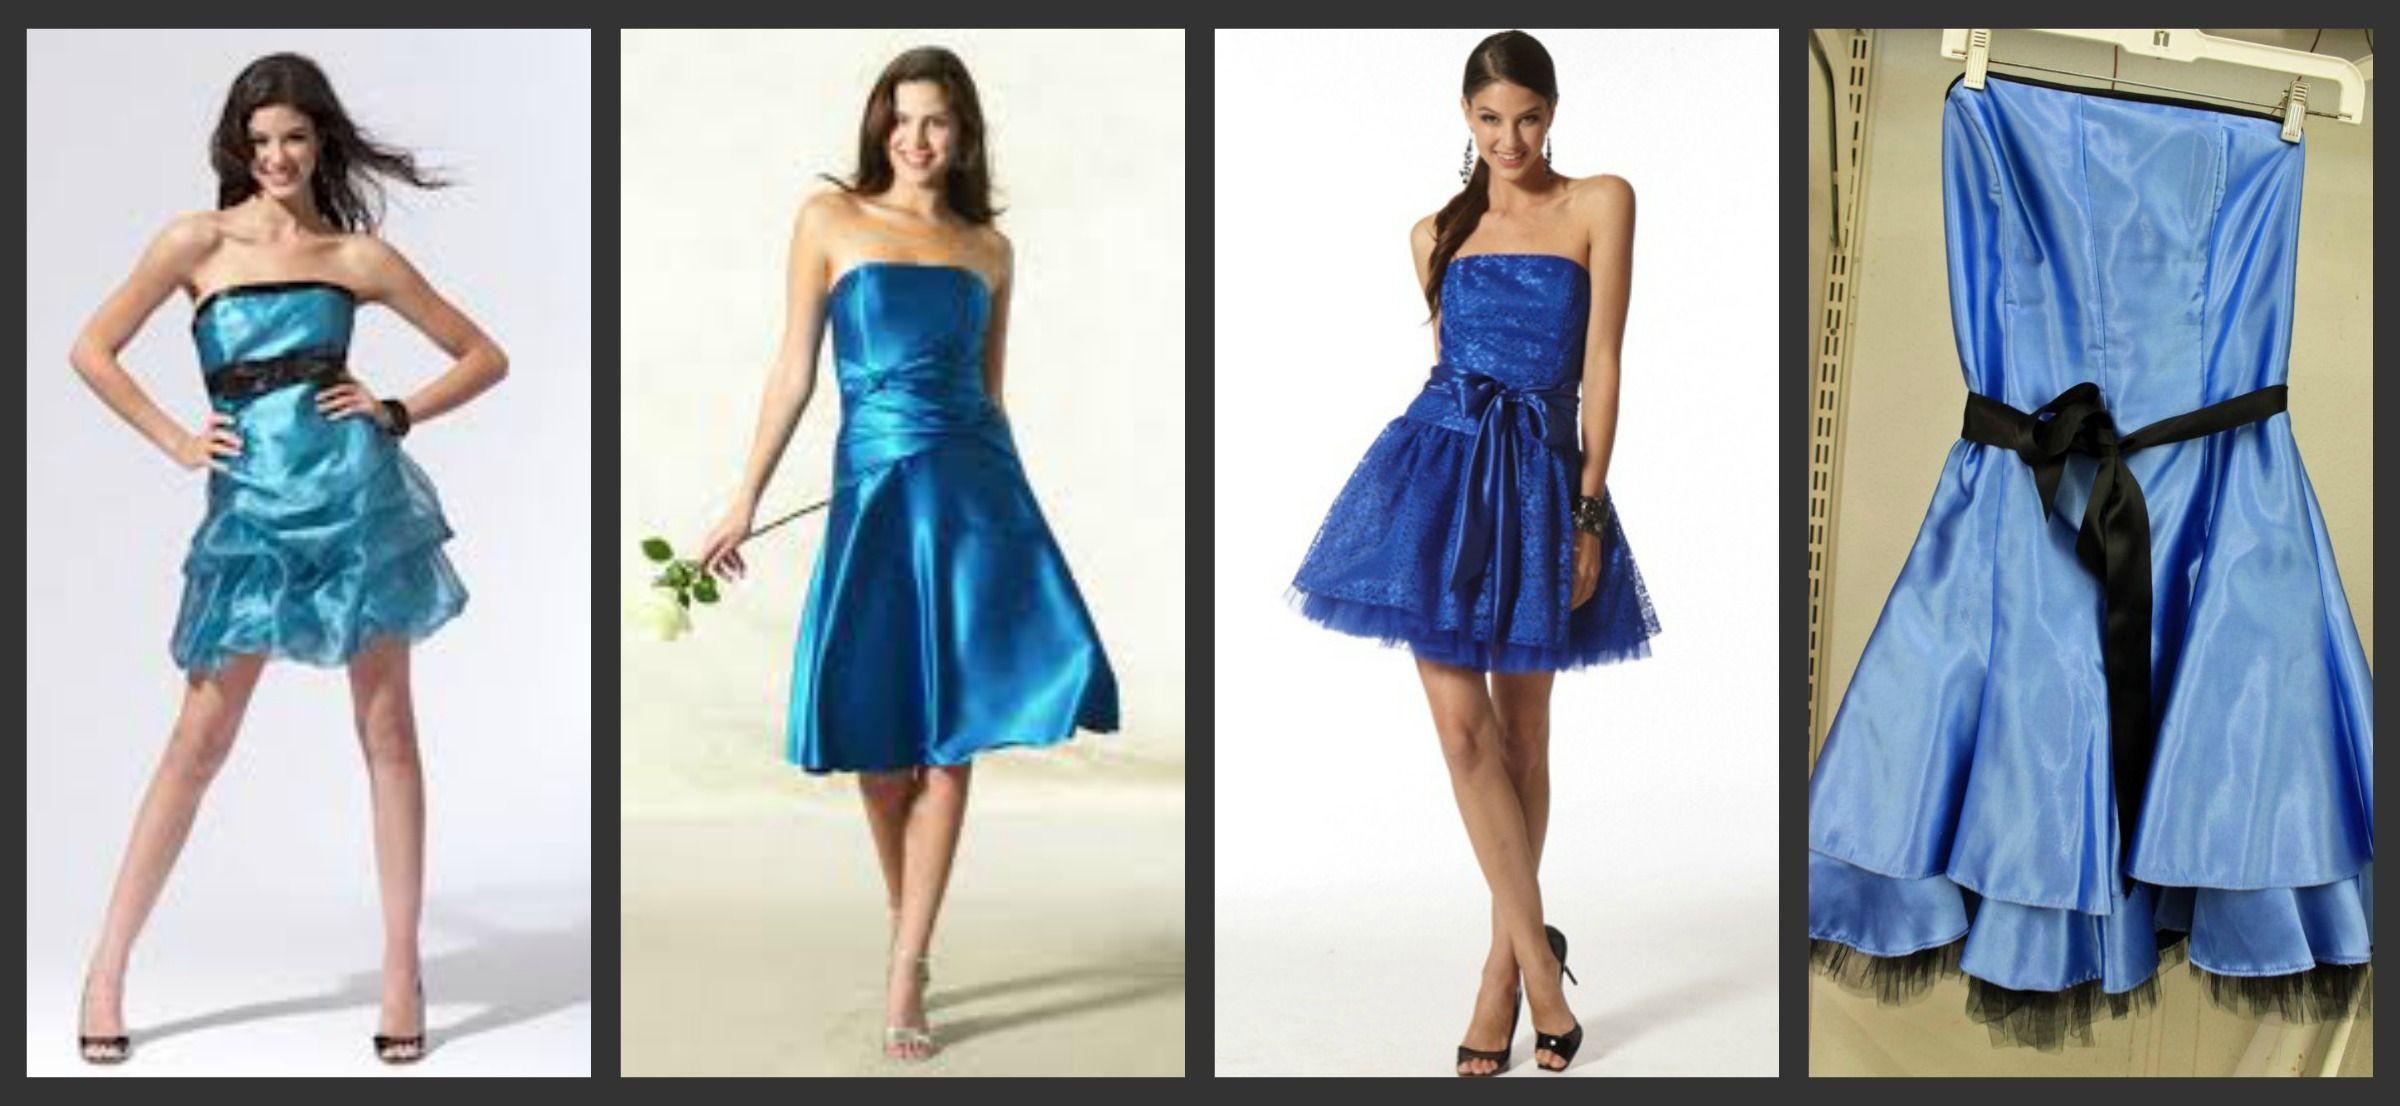 Dorable Resale Shops For Prom Dresses Adornment - Colorful Wedding ...